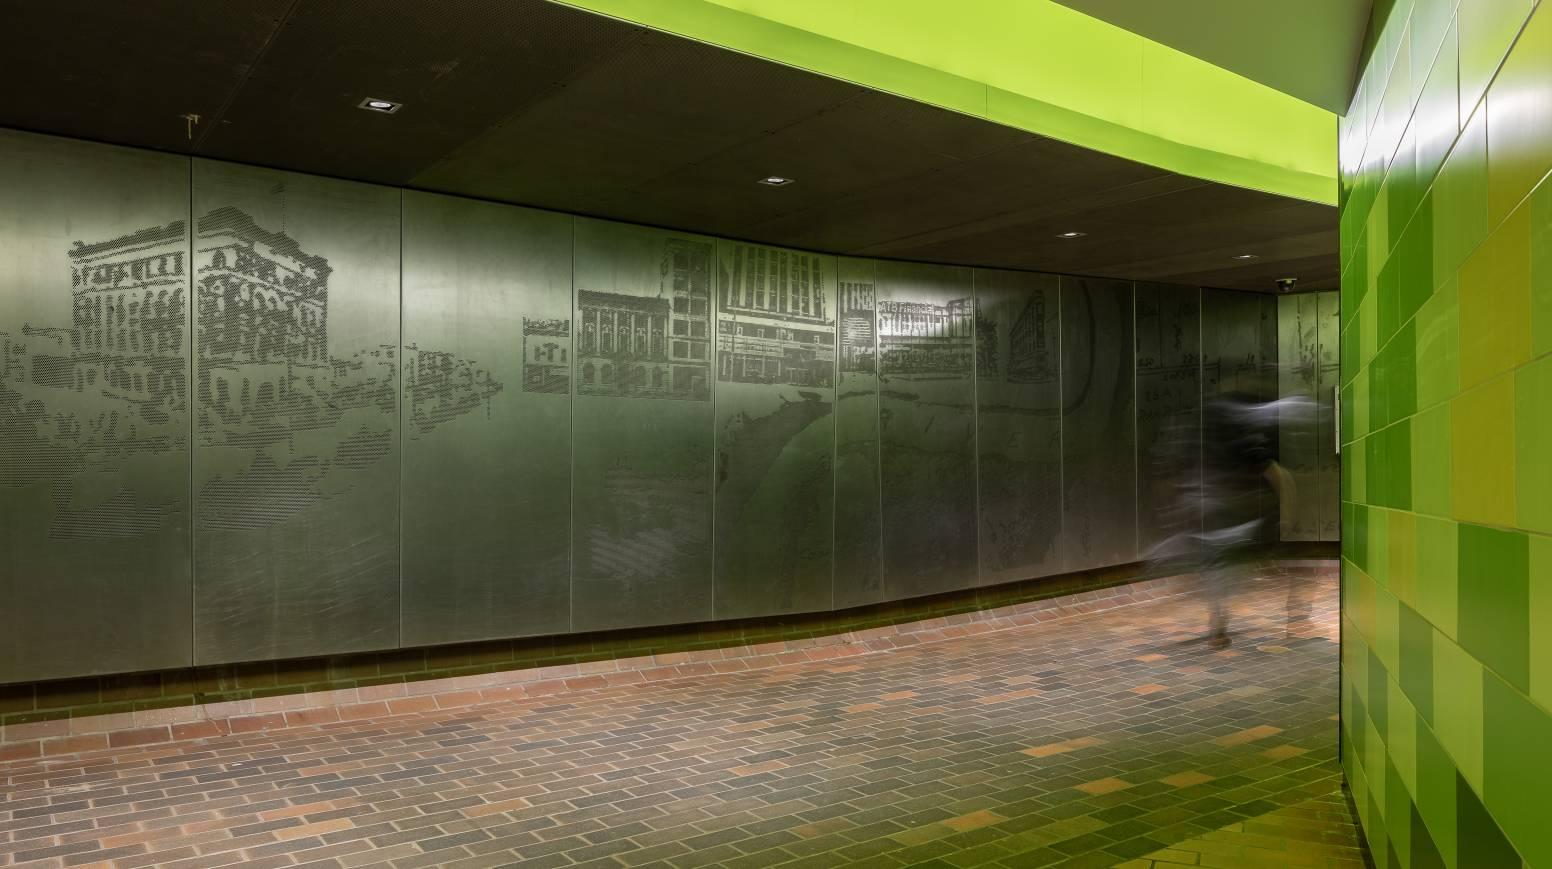 Custom Perforated Metal Panel Imaging Collage